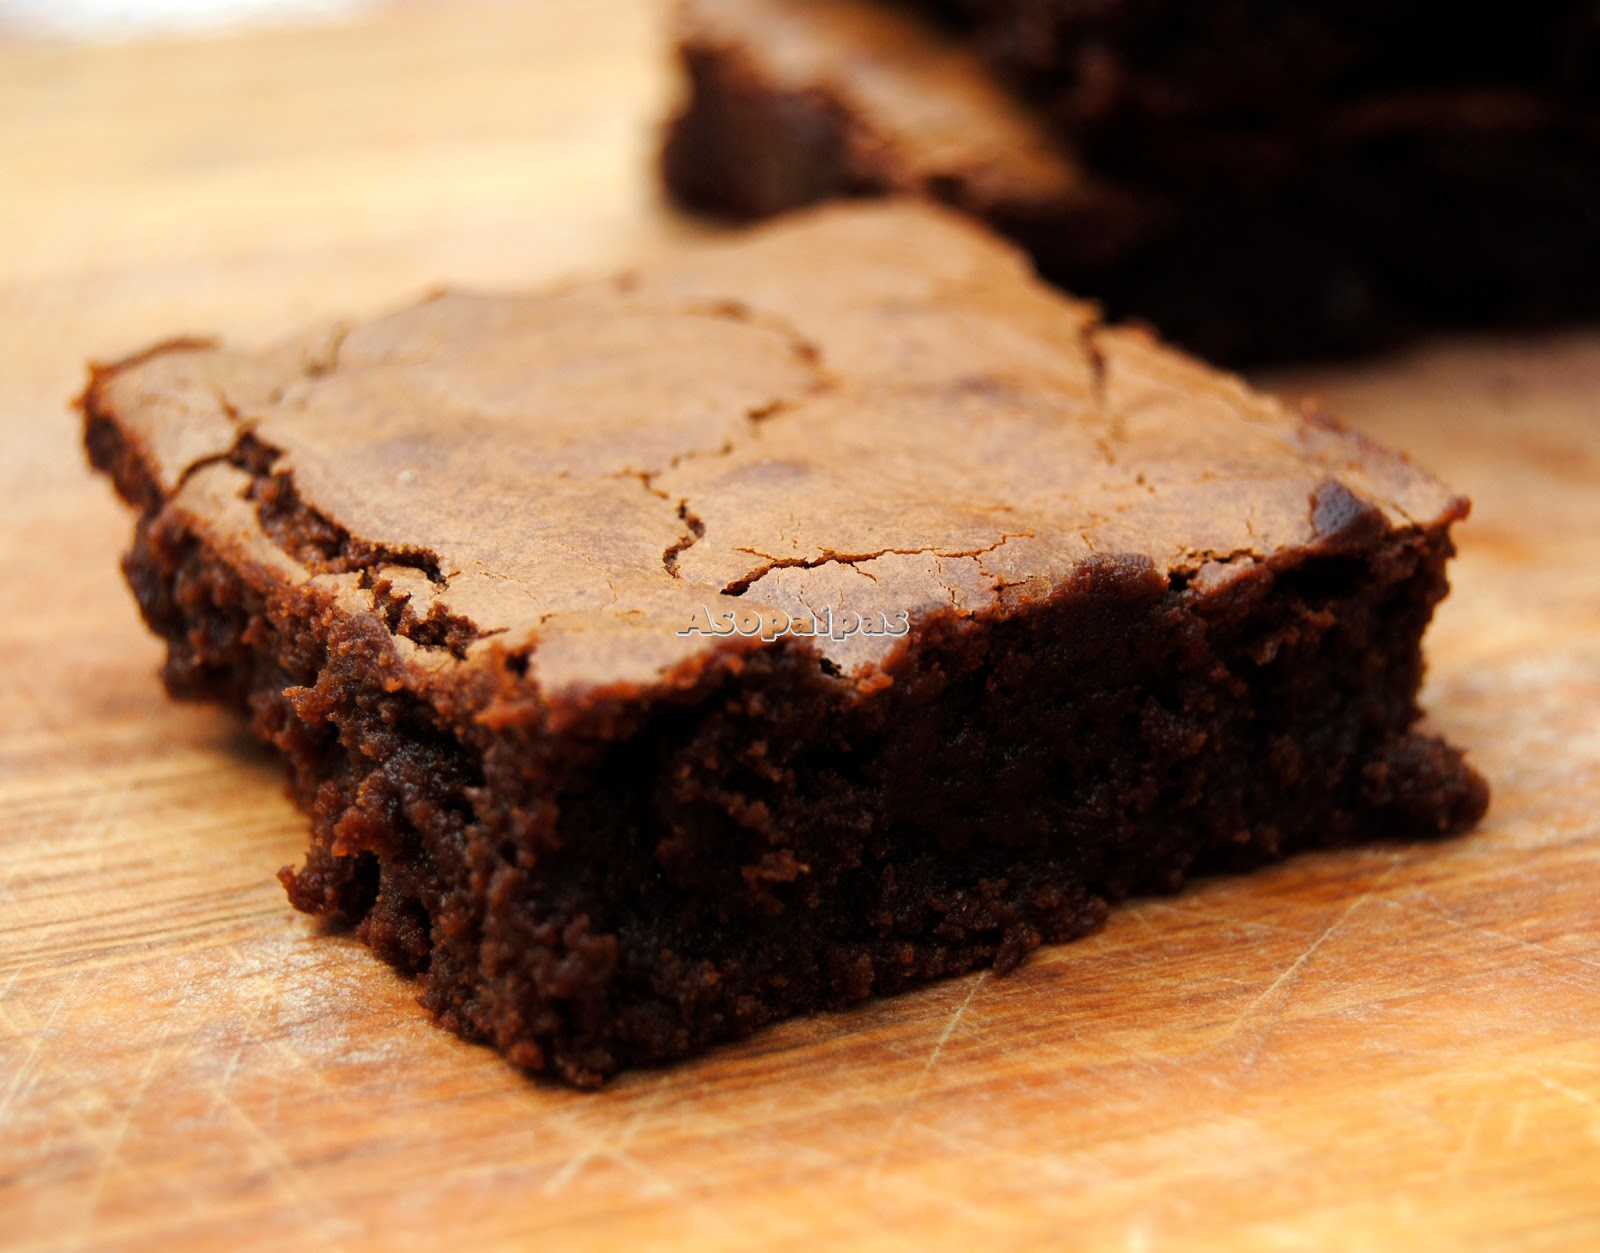 Asopaipas. Recetas de Cocina Casera .: Fudgy Chocolate Brownies